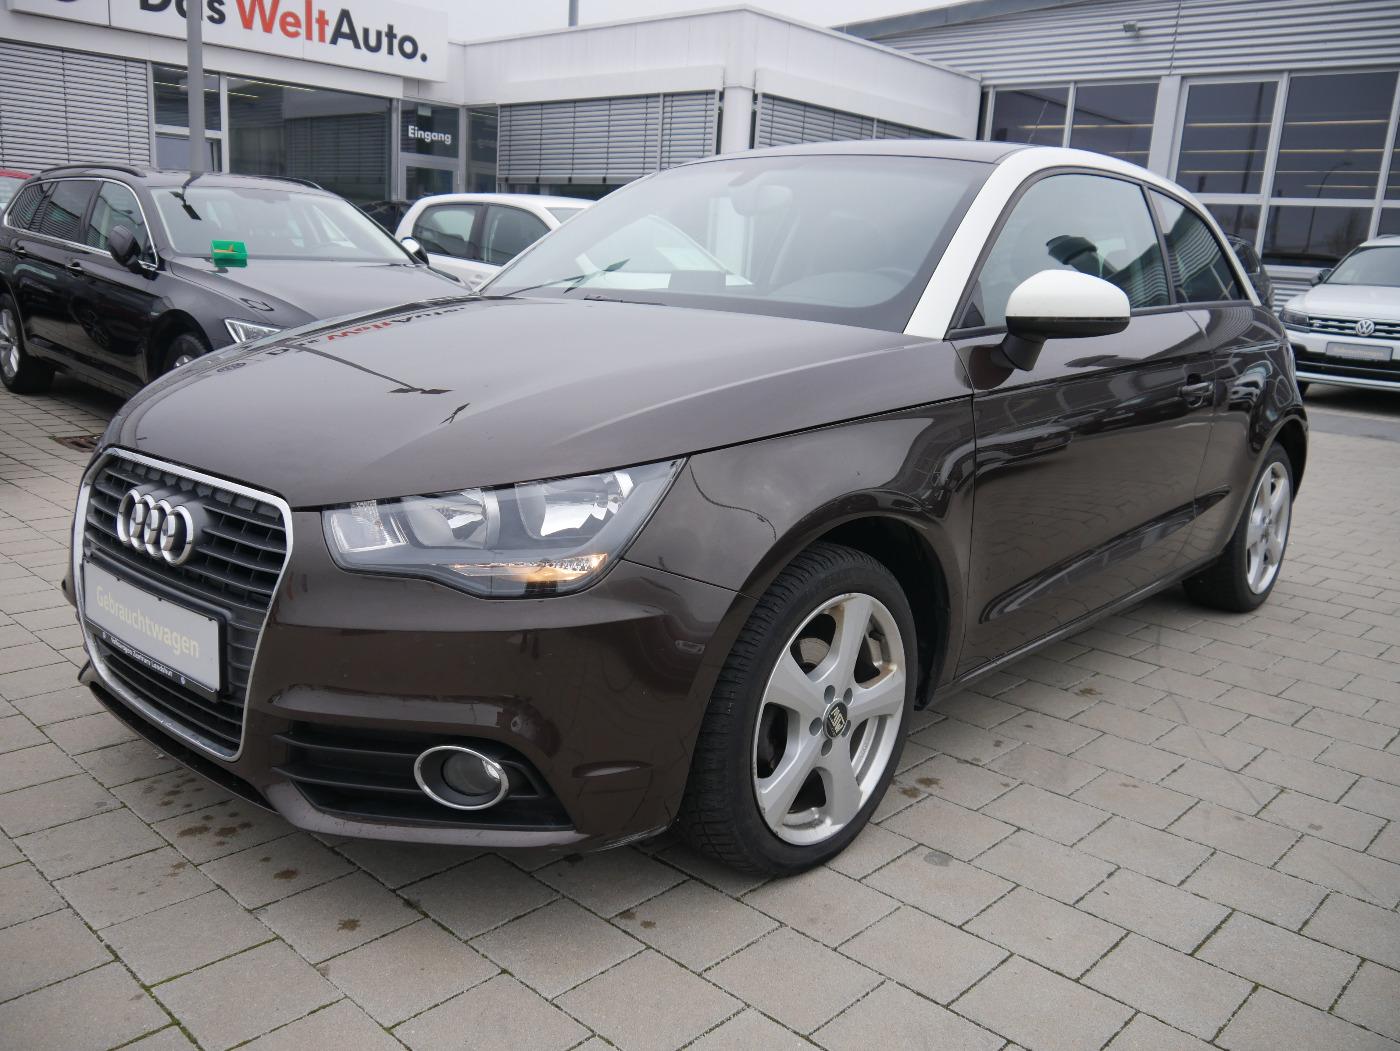 Audi A1 1.2 TFSI Ambition Sportsitze Sitzh. Garantie, Jahr 2012, Benzin